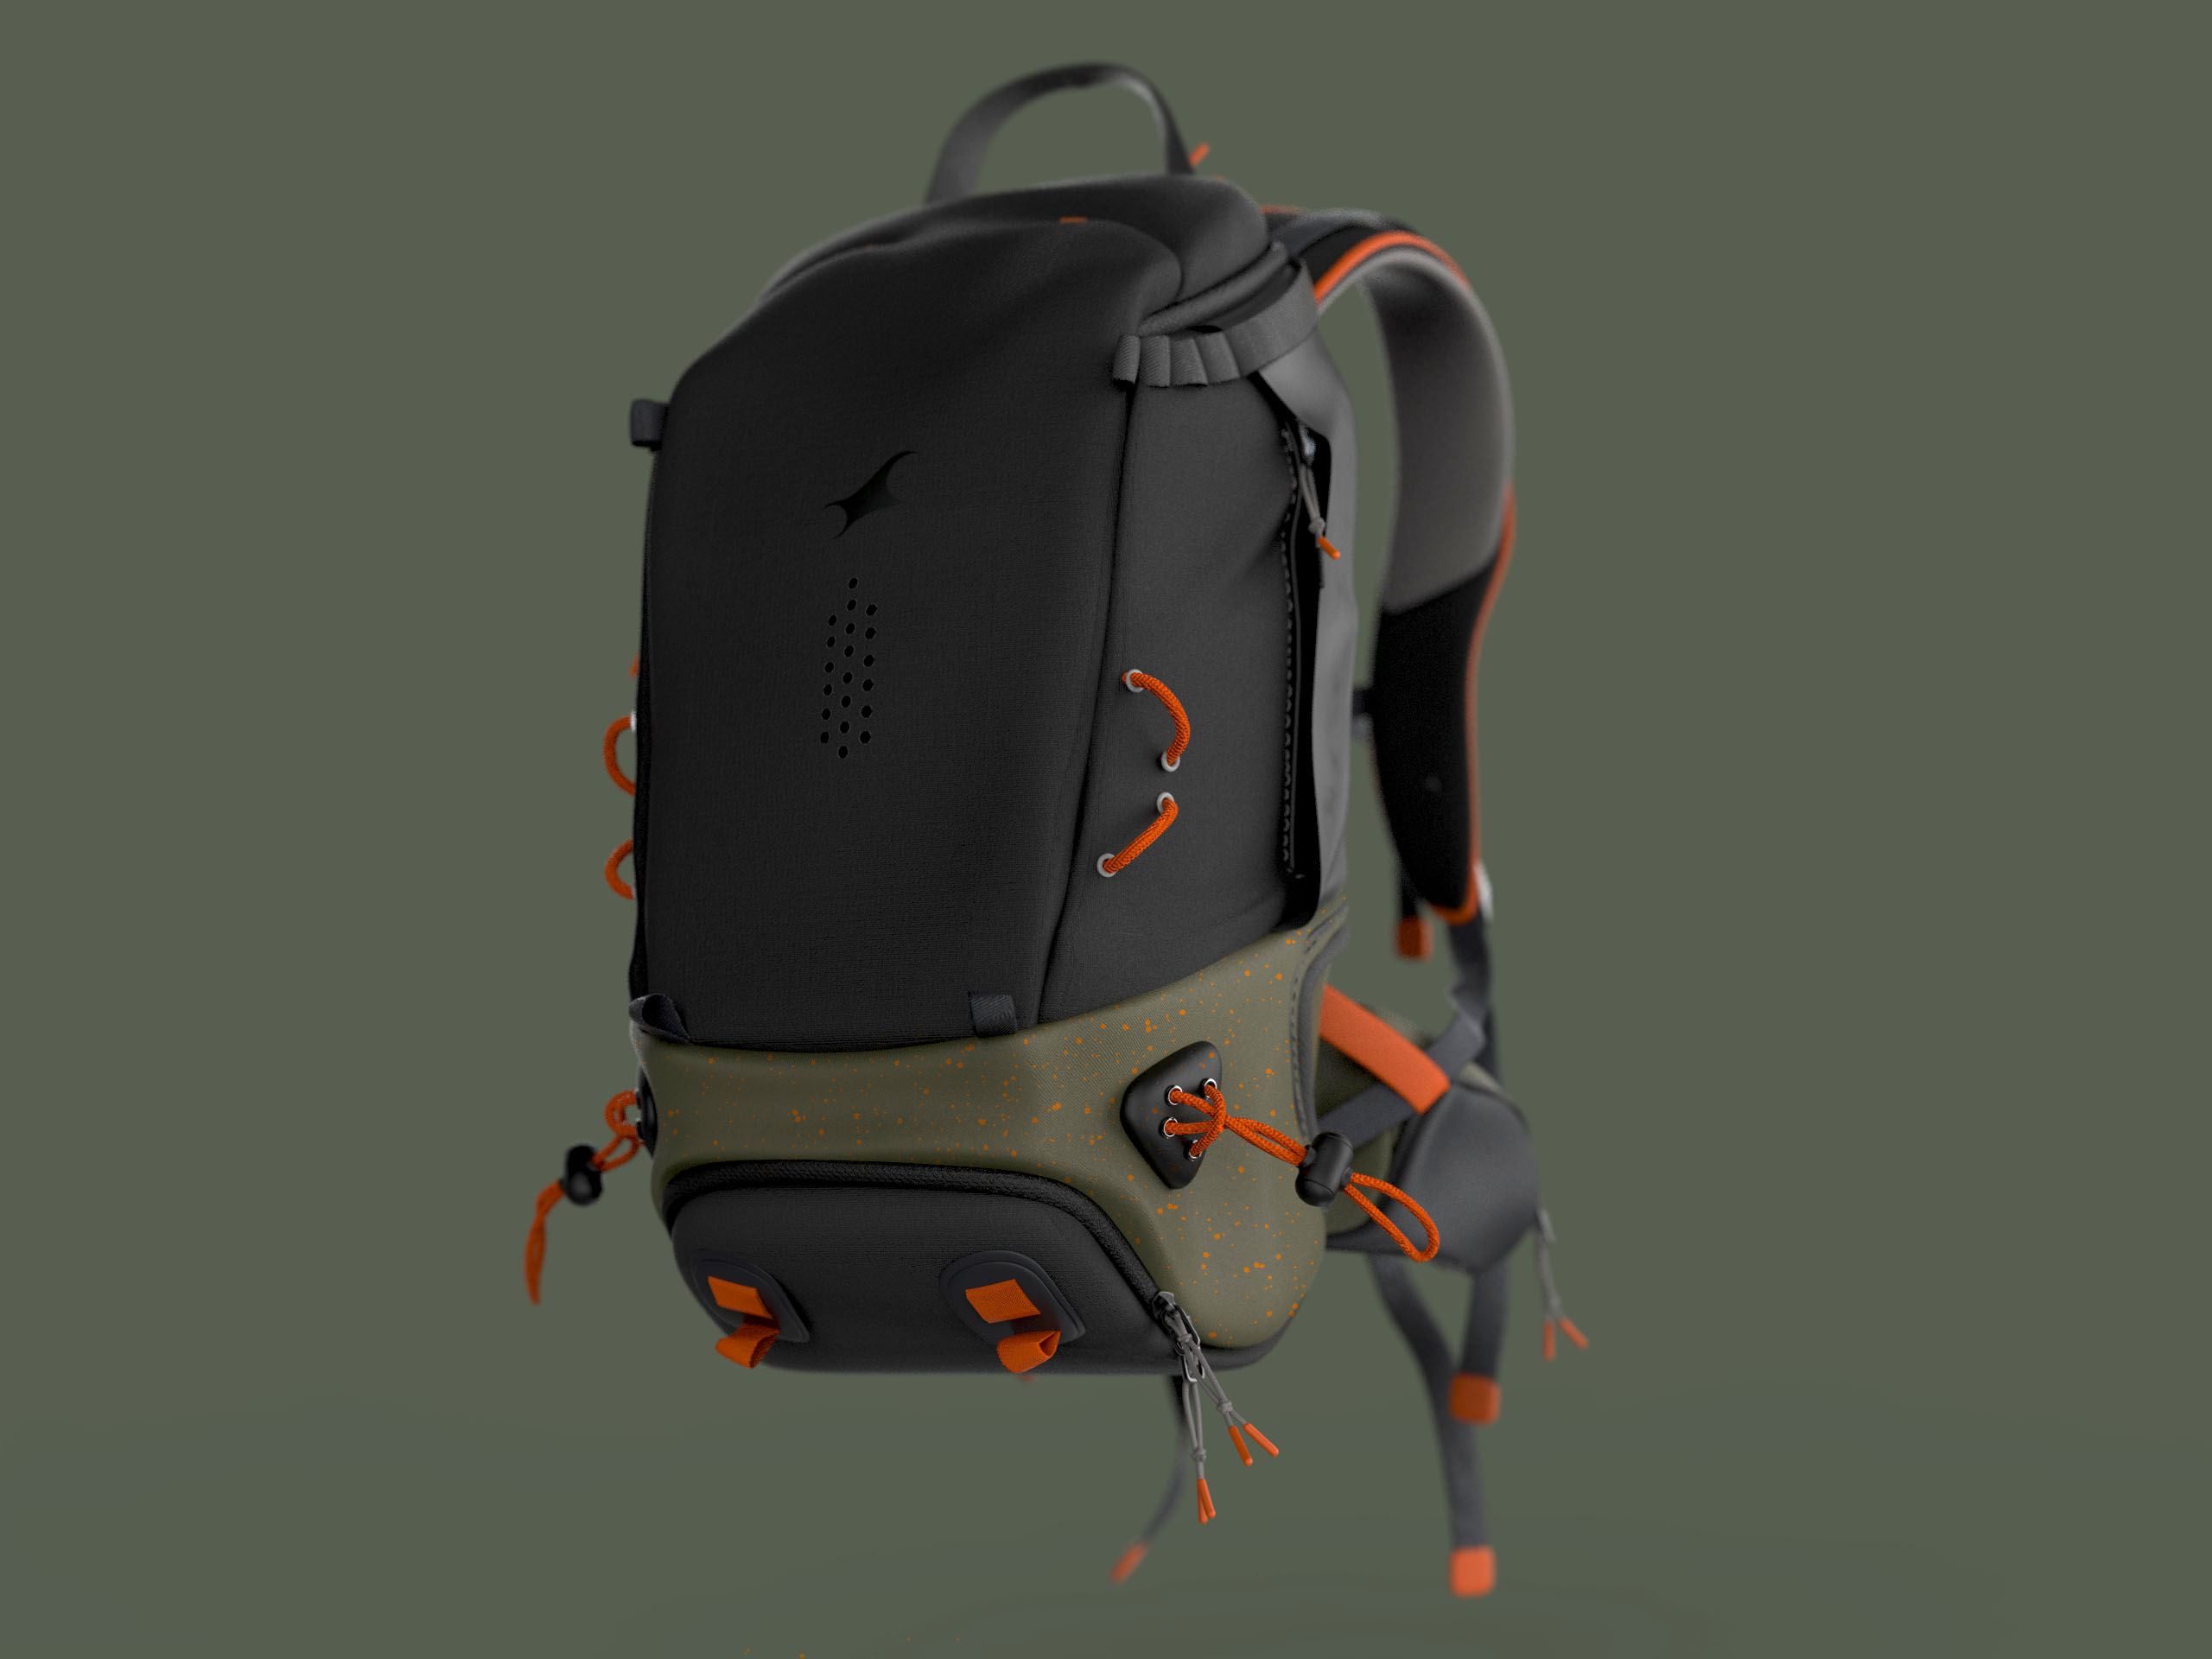 akhil-krishnan-gravity-sketch-keyshot-backpack-challenge-00